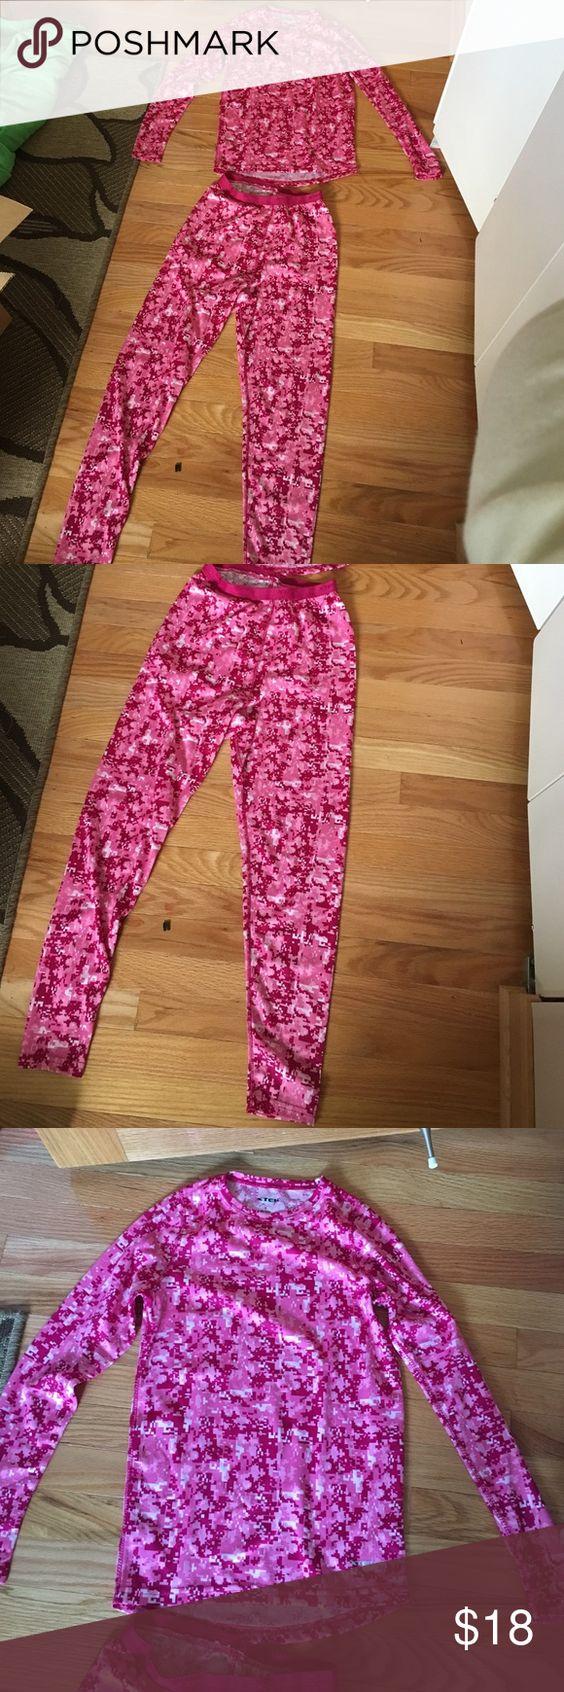 long underwear set pink long underwear set brand new never worn in great